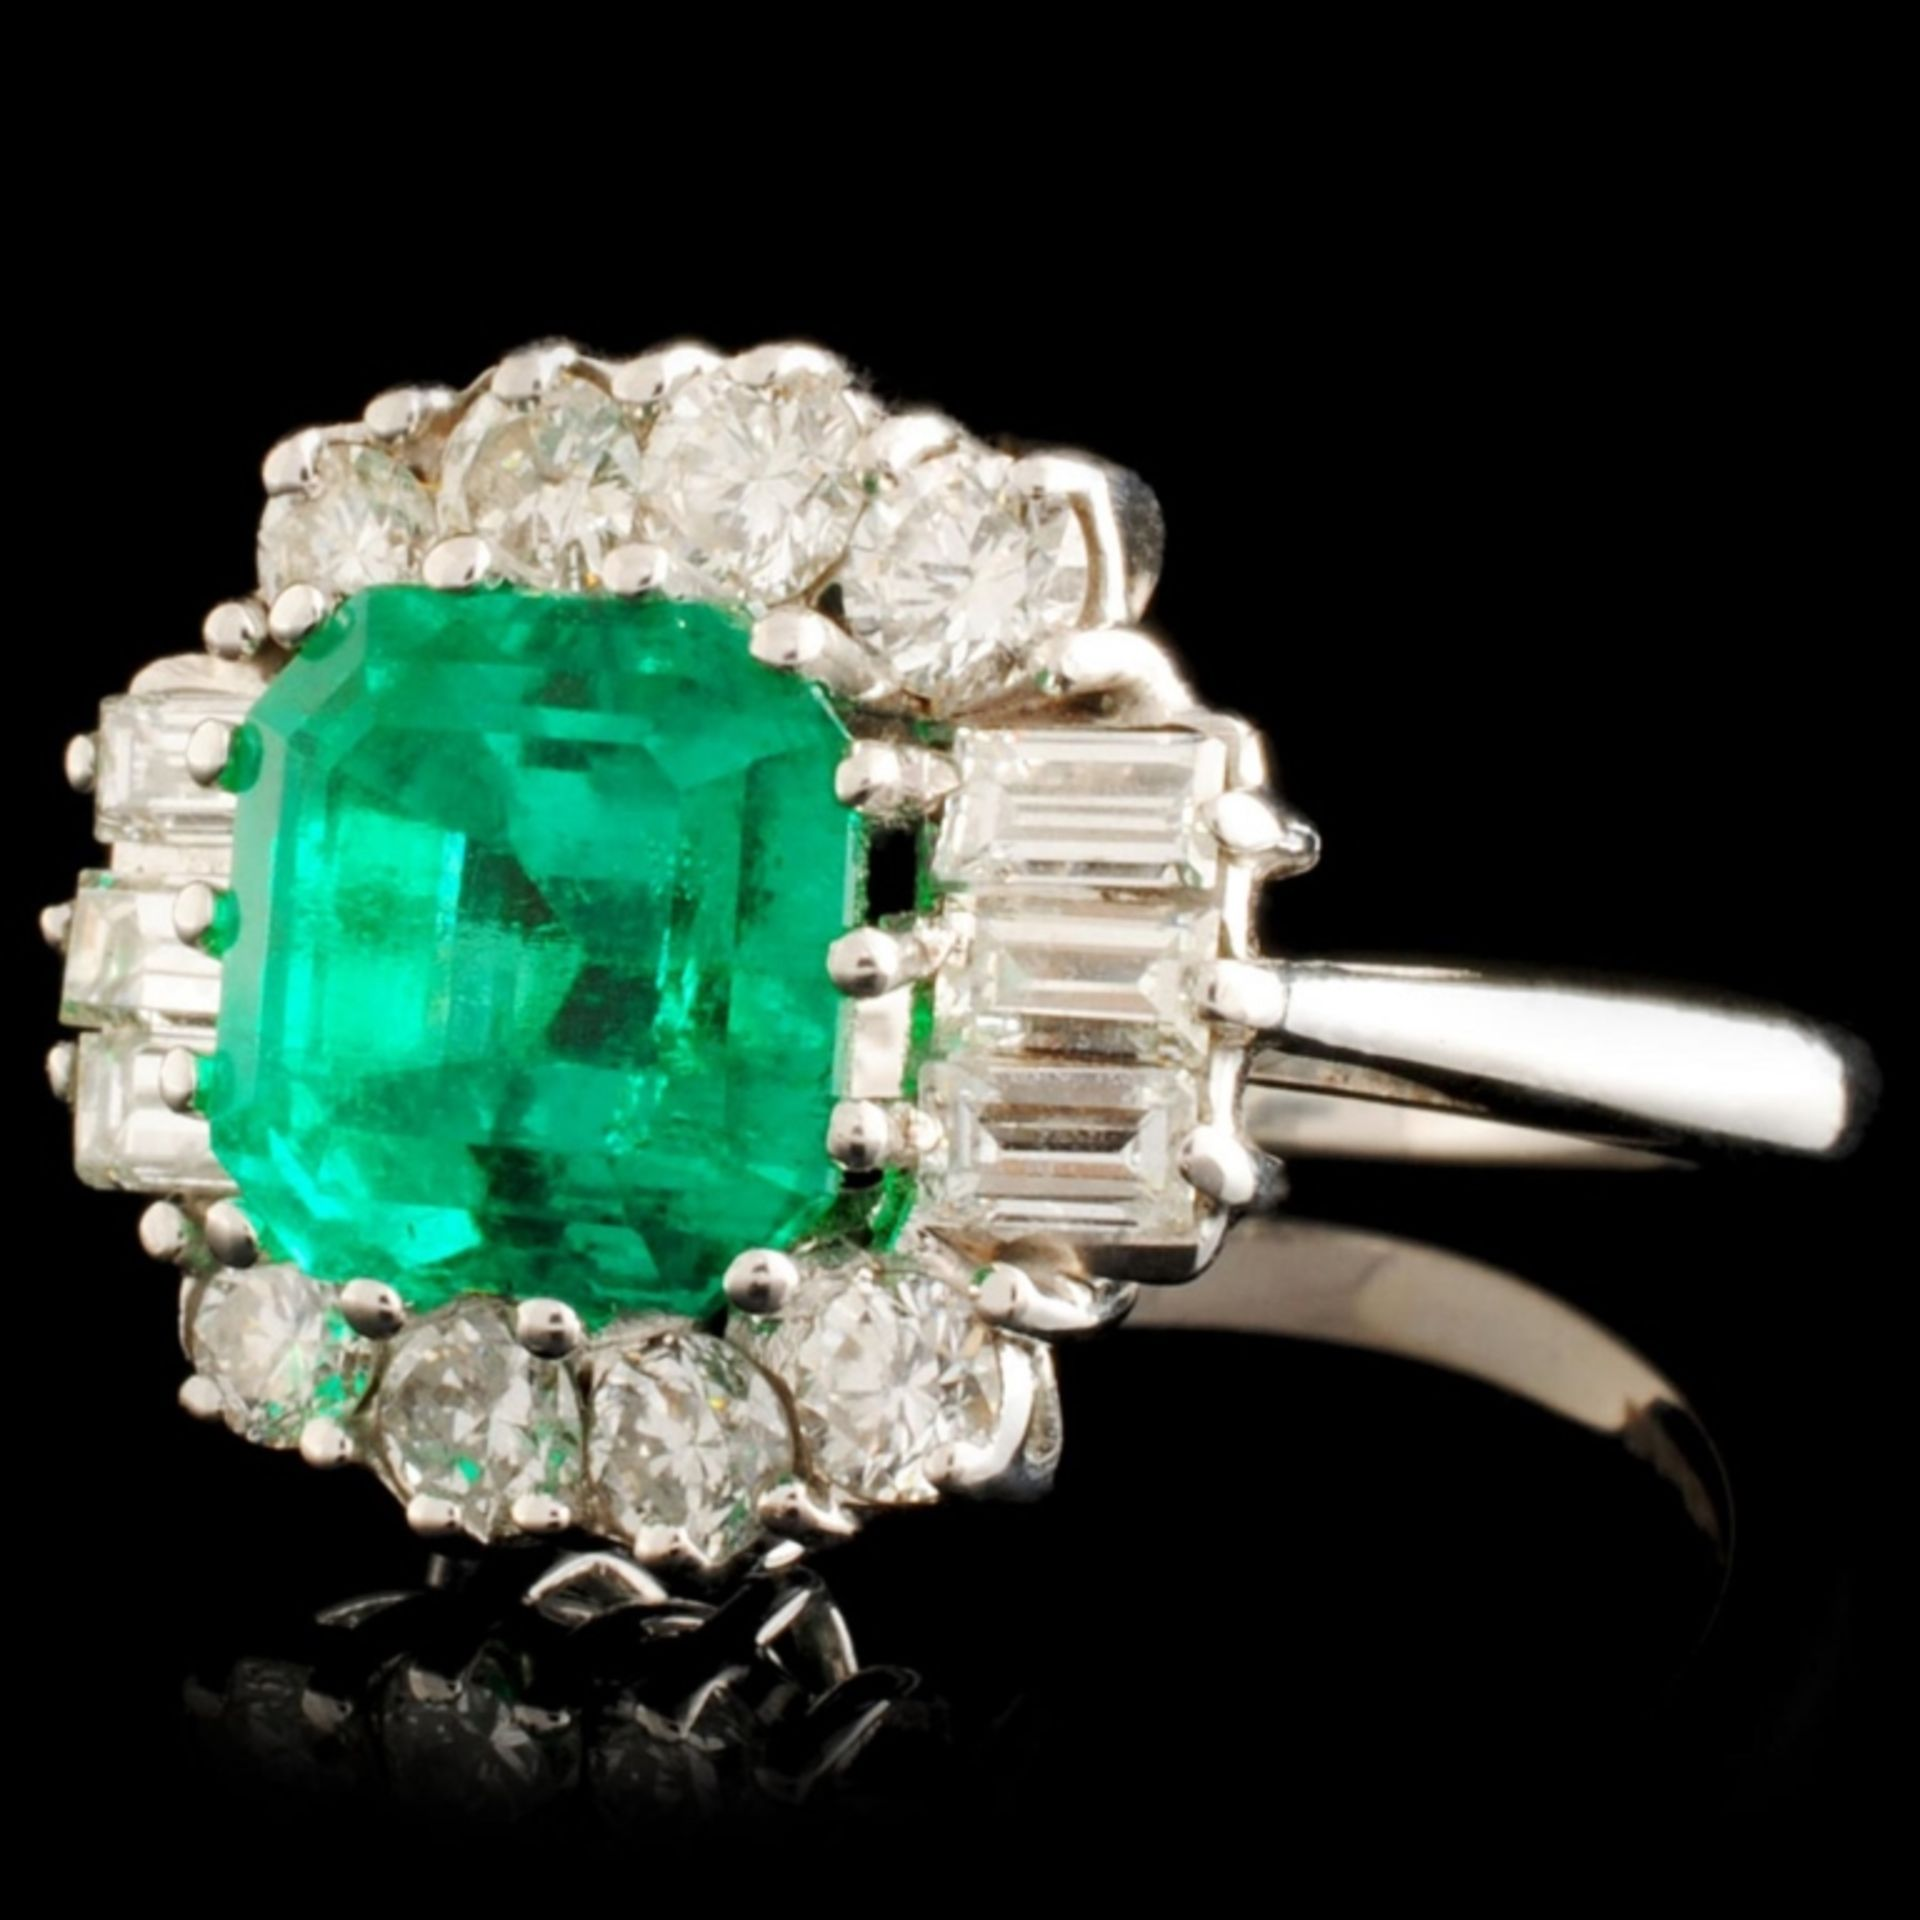 18K Gold 2.80ct Emerald & 1.00ctw Diamond Ring - Image 2 of 5